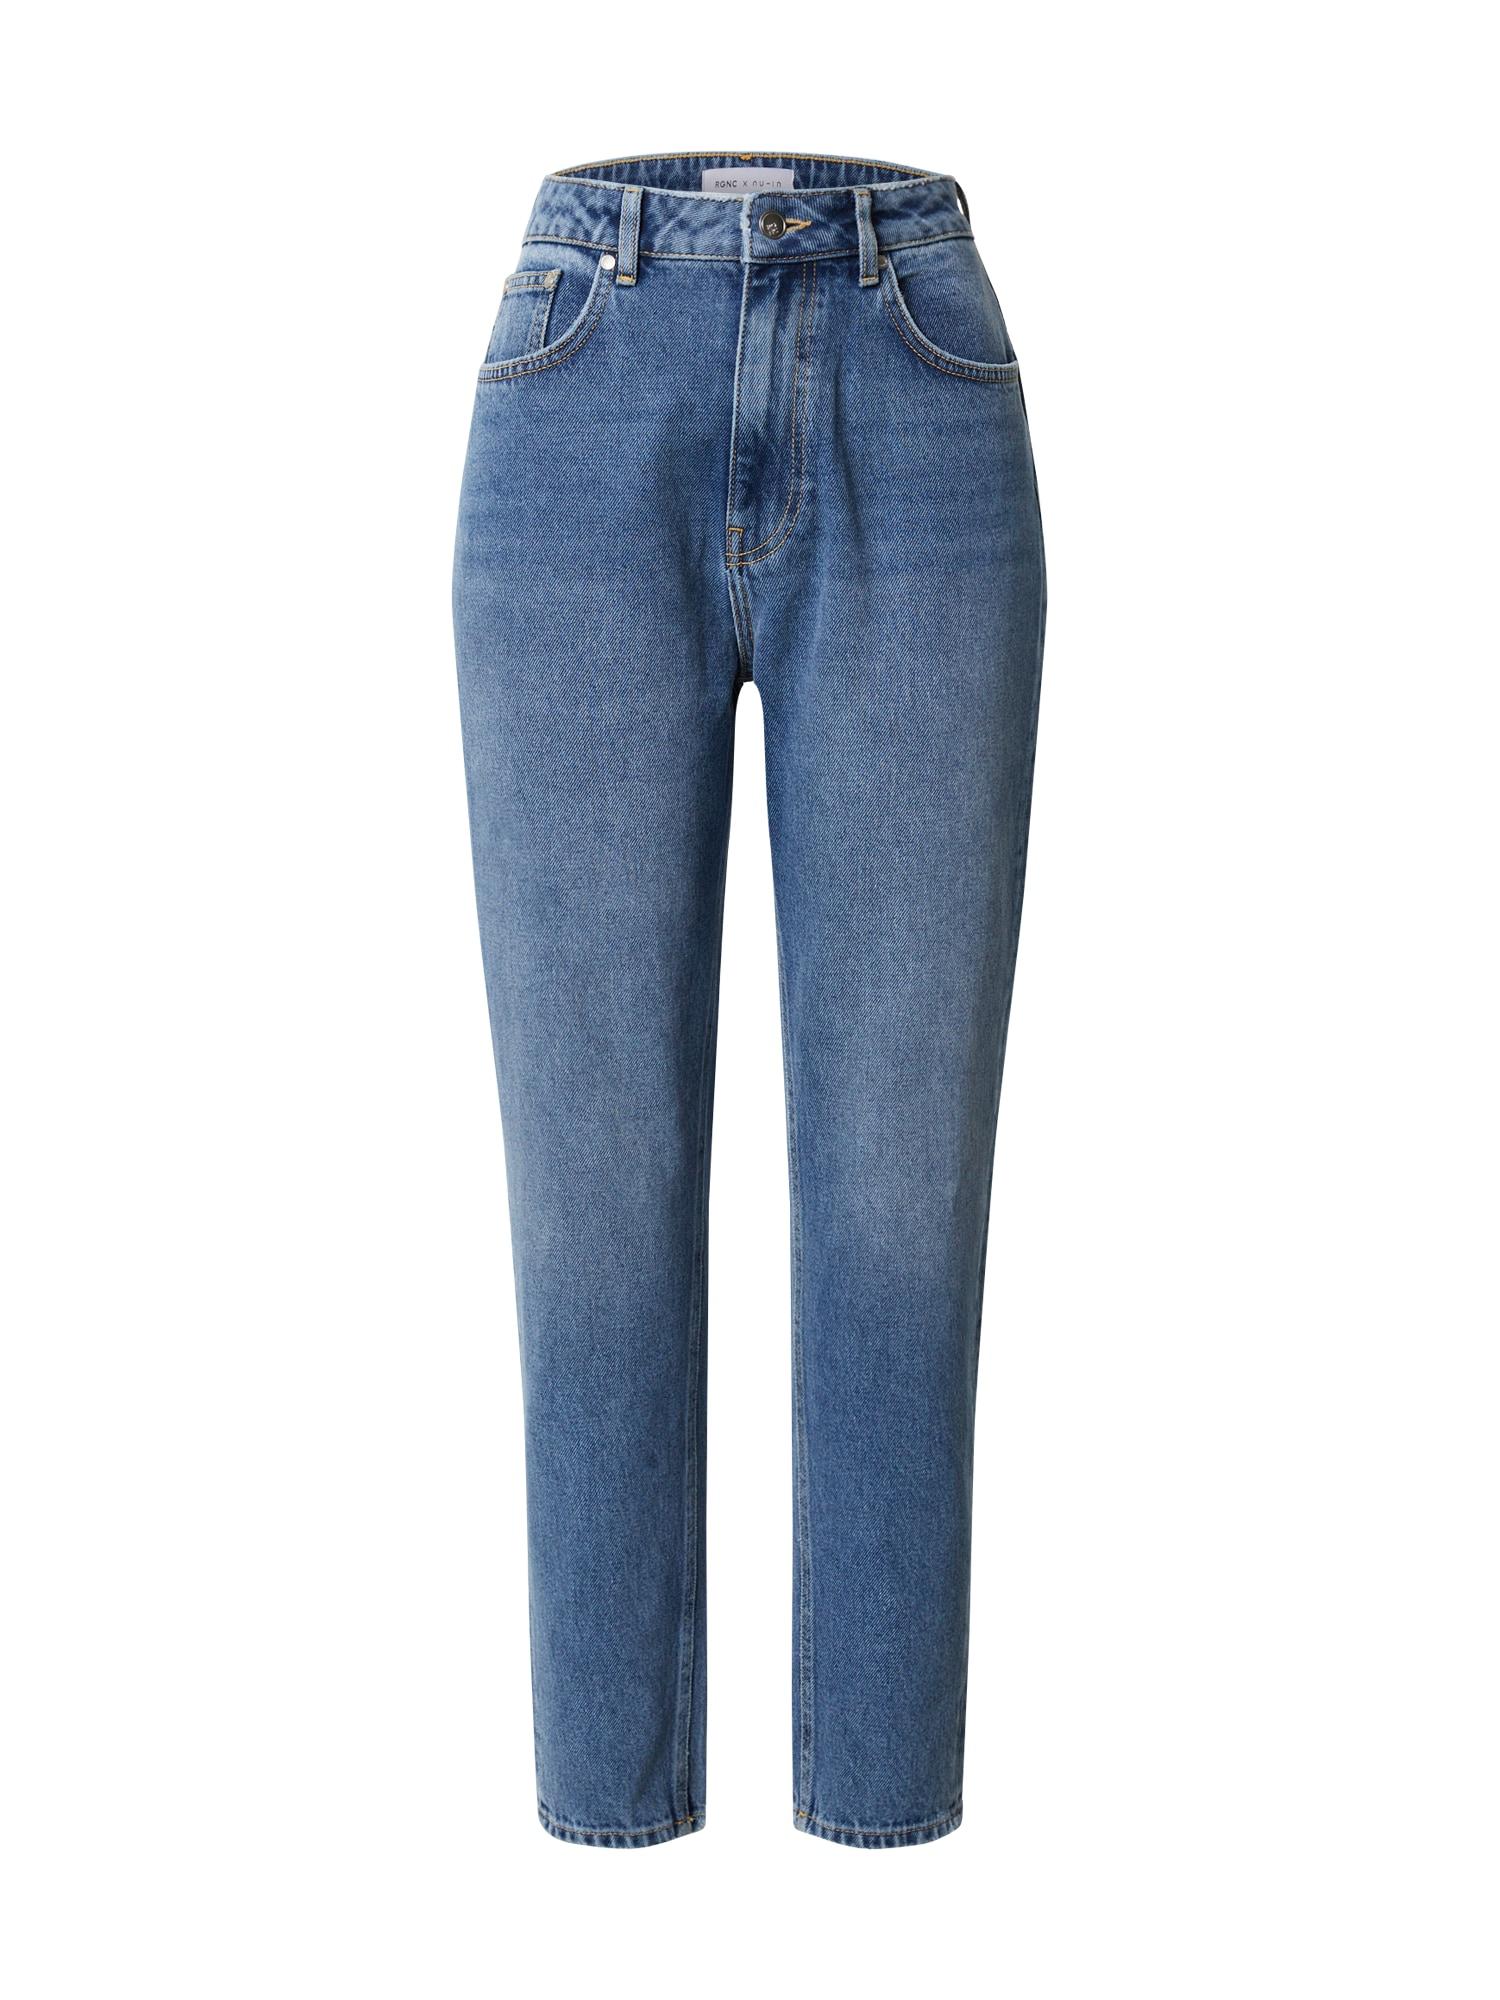 NU-IN Džínsy 'High Rise Straight Jeans'  modrá denim